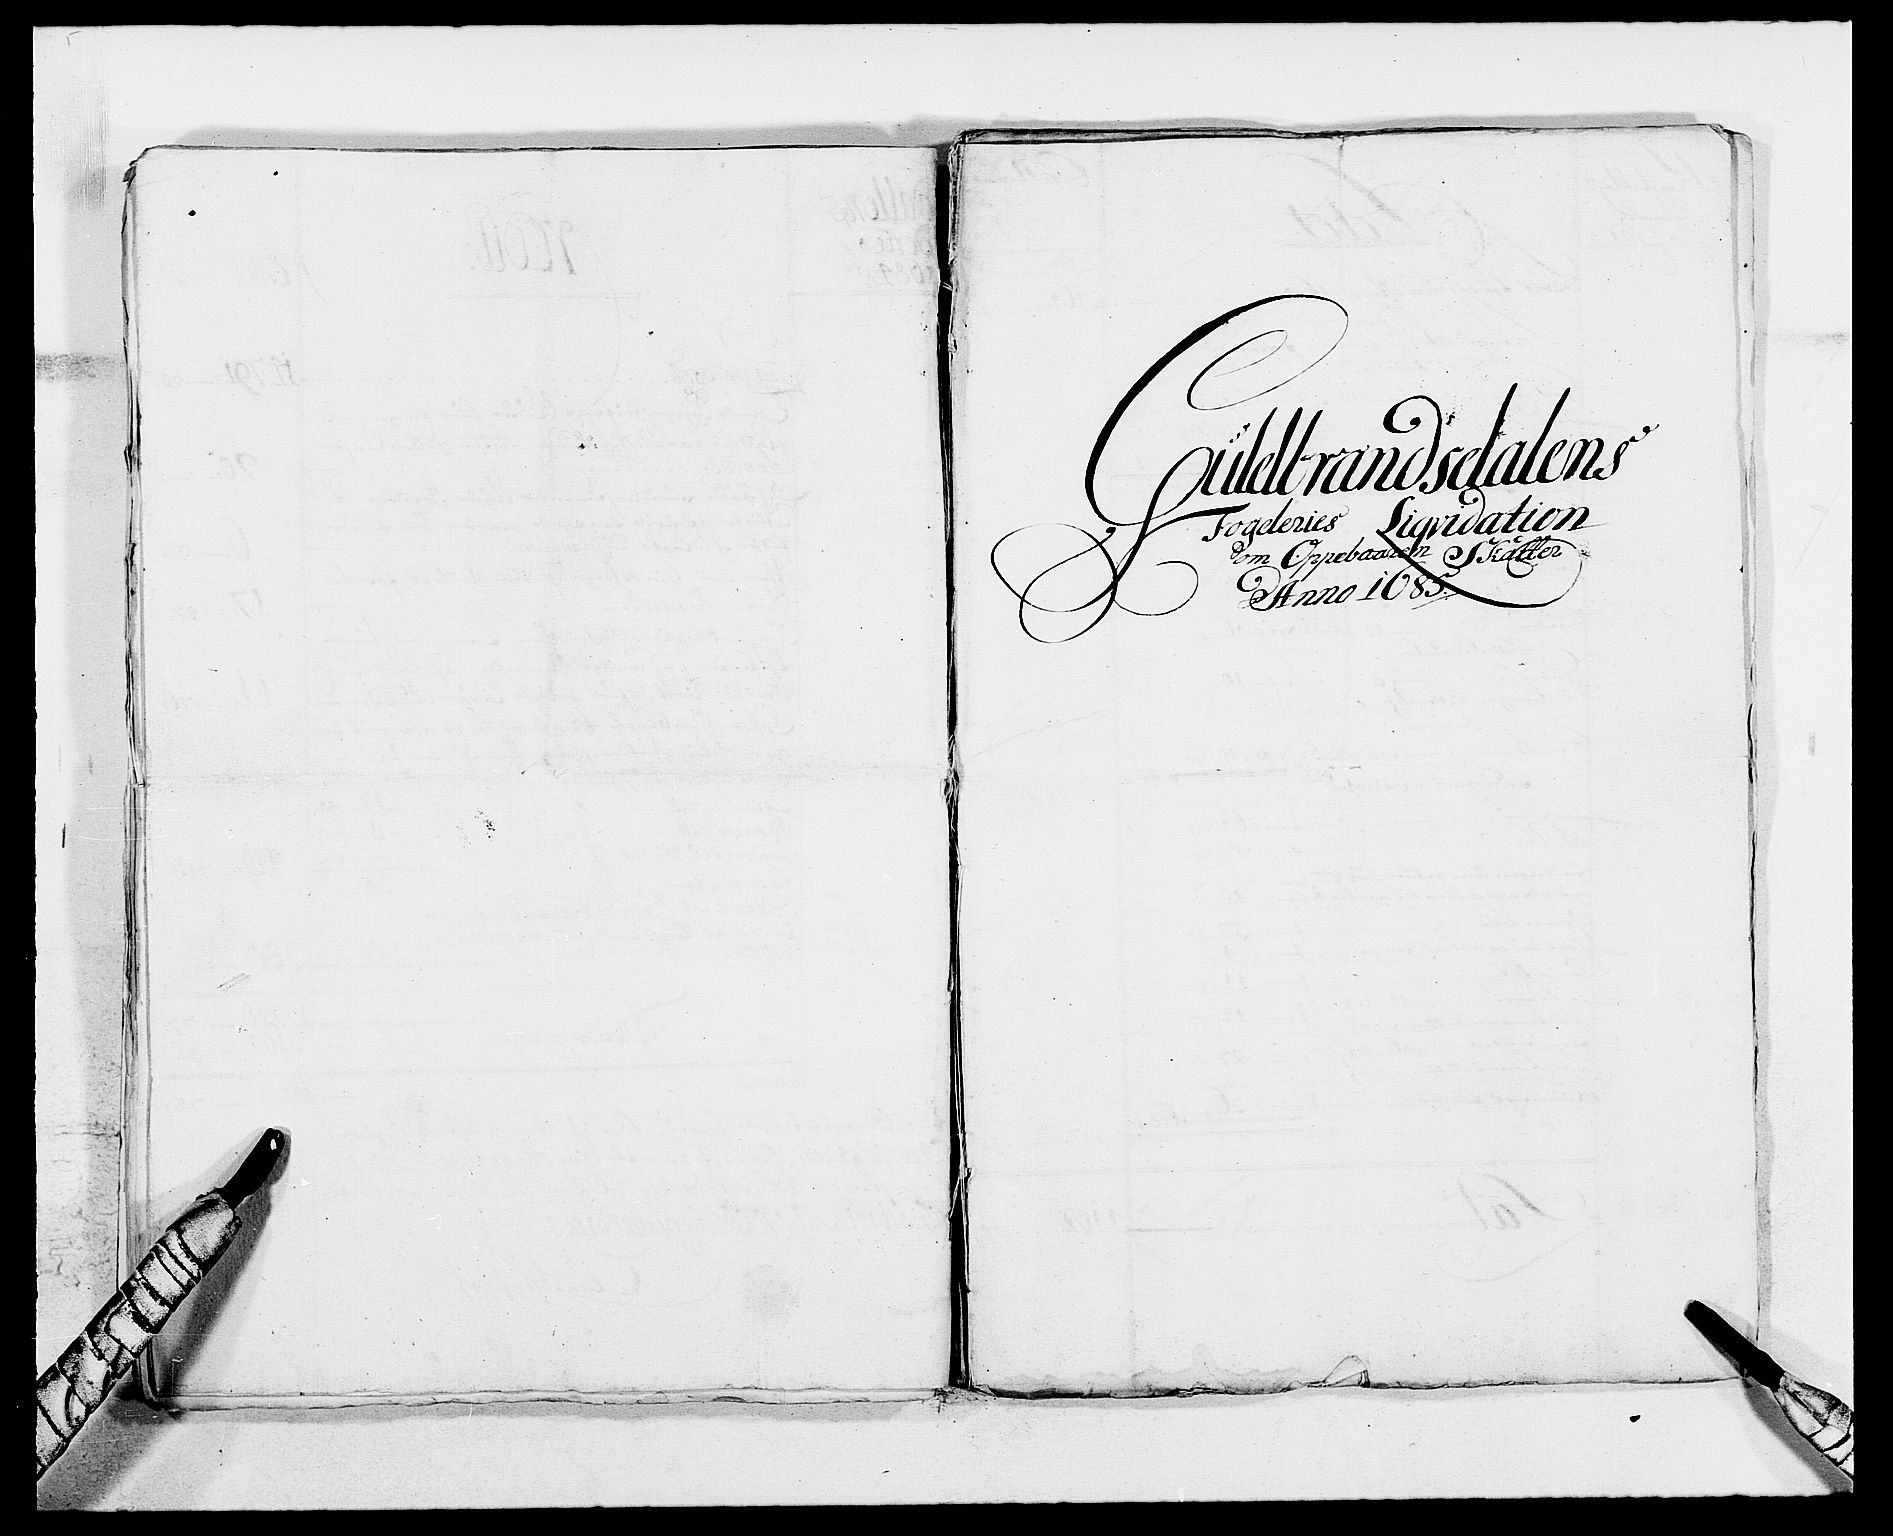 RA, Rentekammeret inntil 1814, Reviderte regnskaper, Fogderegnskap, R17/L1157: Fogderegnskap Gudbrandsdal, 1682-1689, s. 16